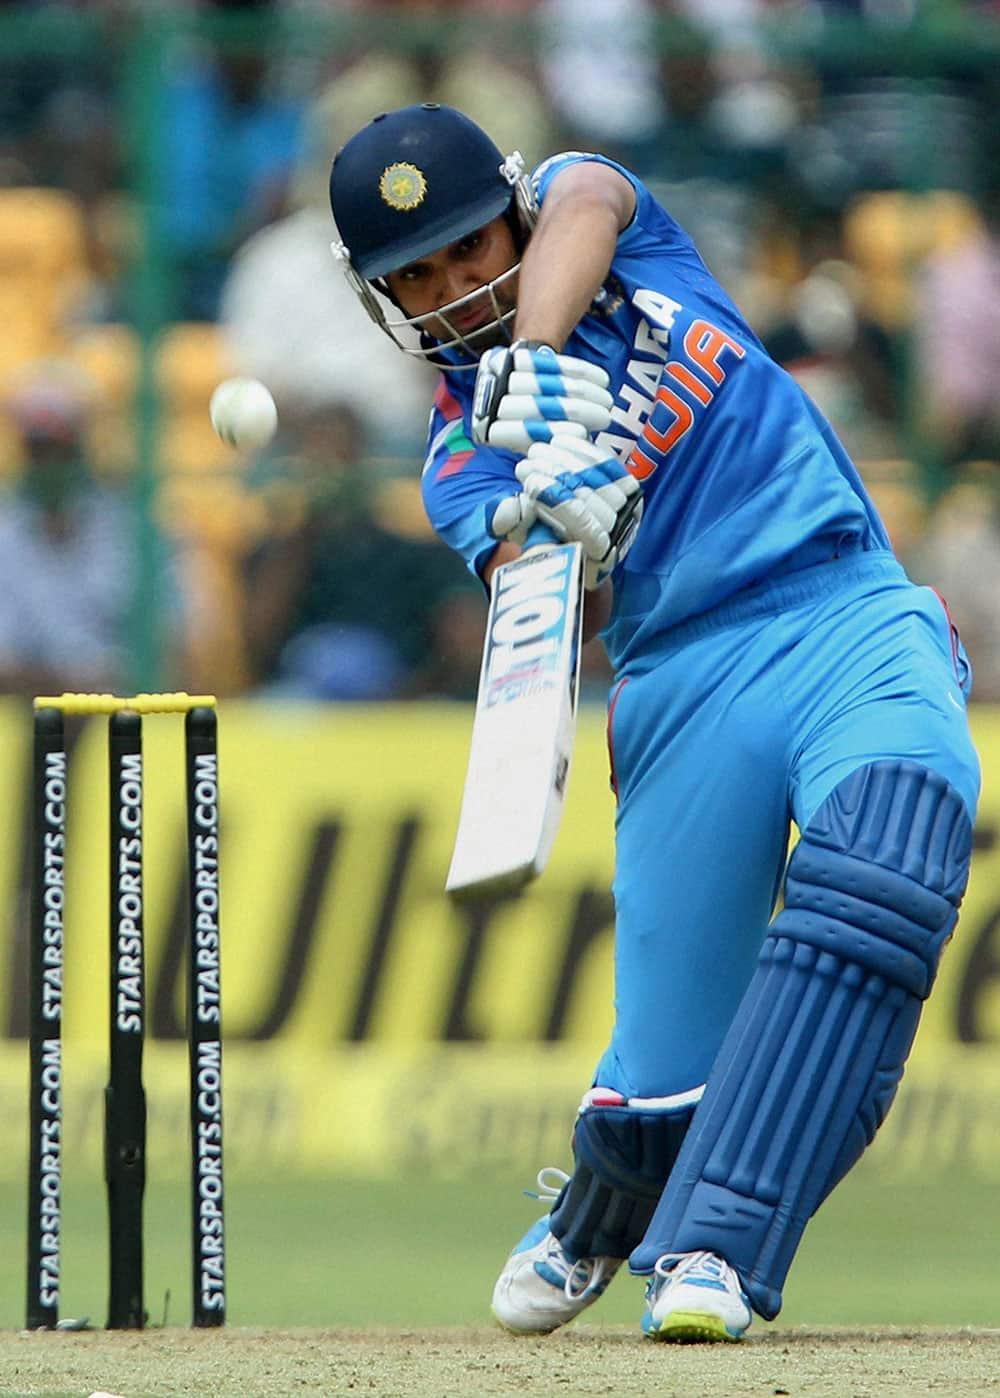 Rohit Sharma plays a shot during the 7th ODI against Australia at Chinnaswamy stadium in Bengaluru..